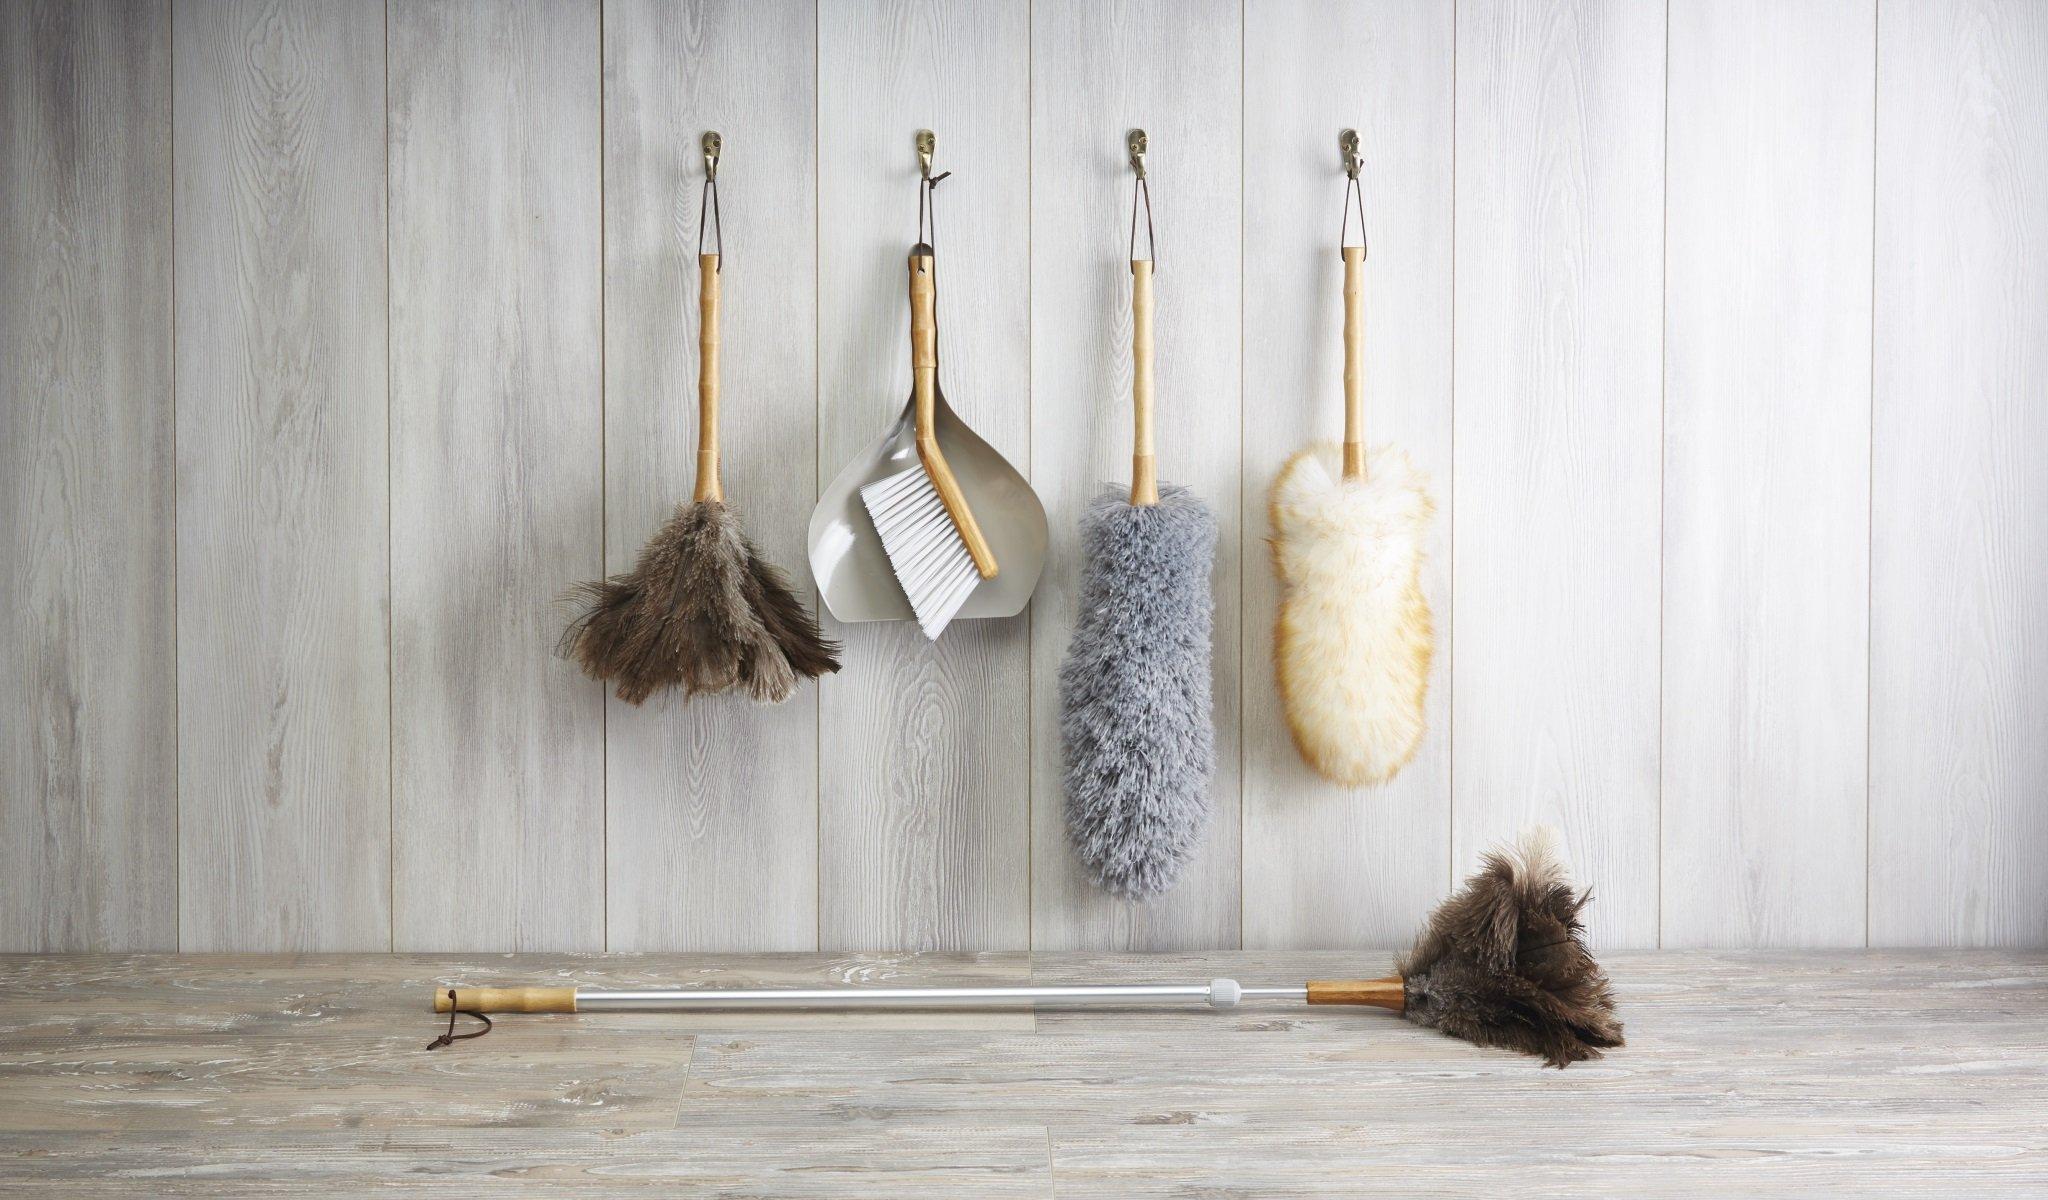 48/cm Kitchencraft Living Nostalgia Tradizionale Naturale Lambswool Duster Marrone 48,3/cm